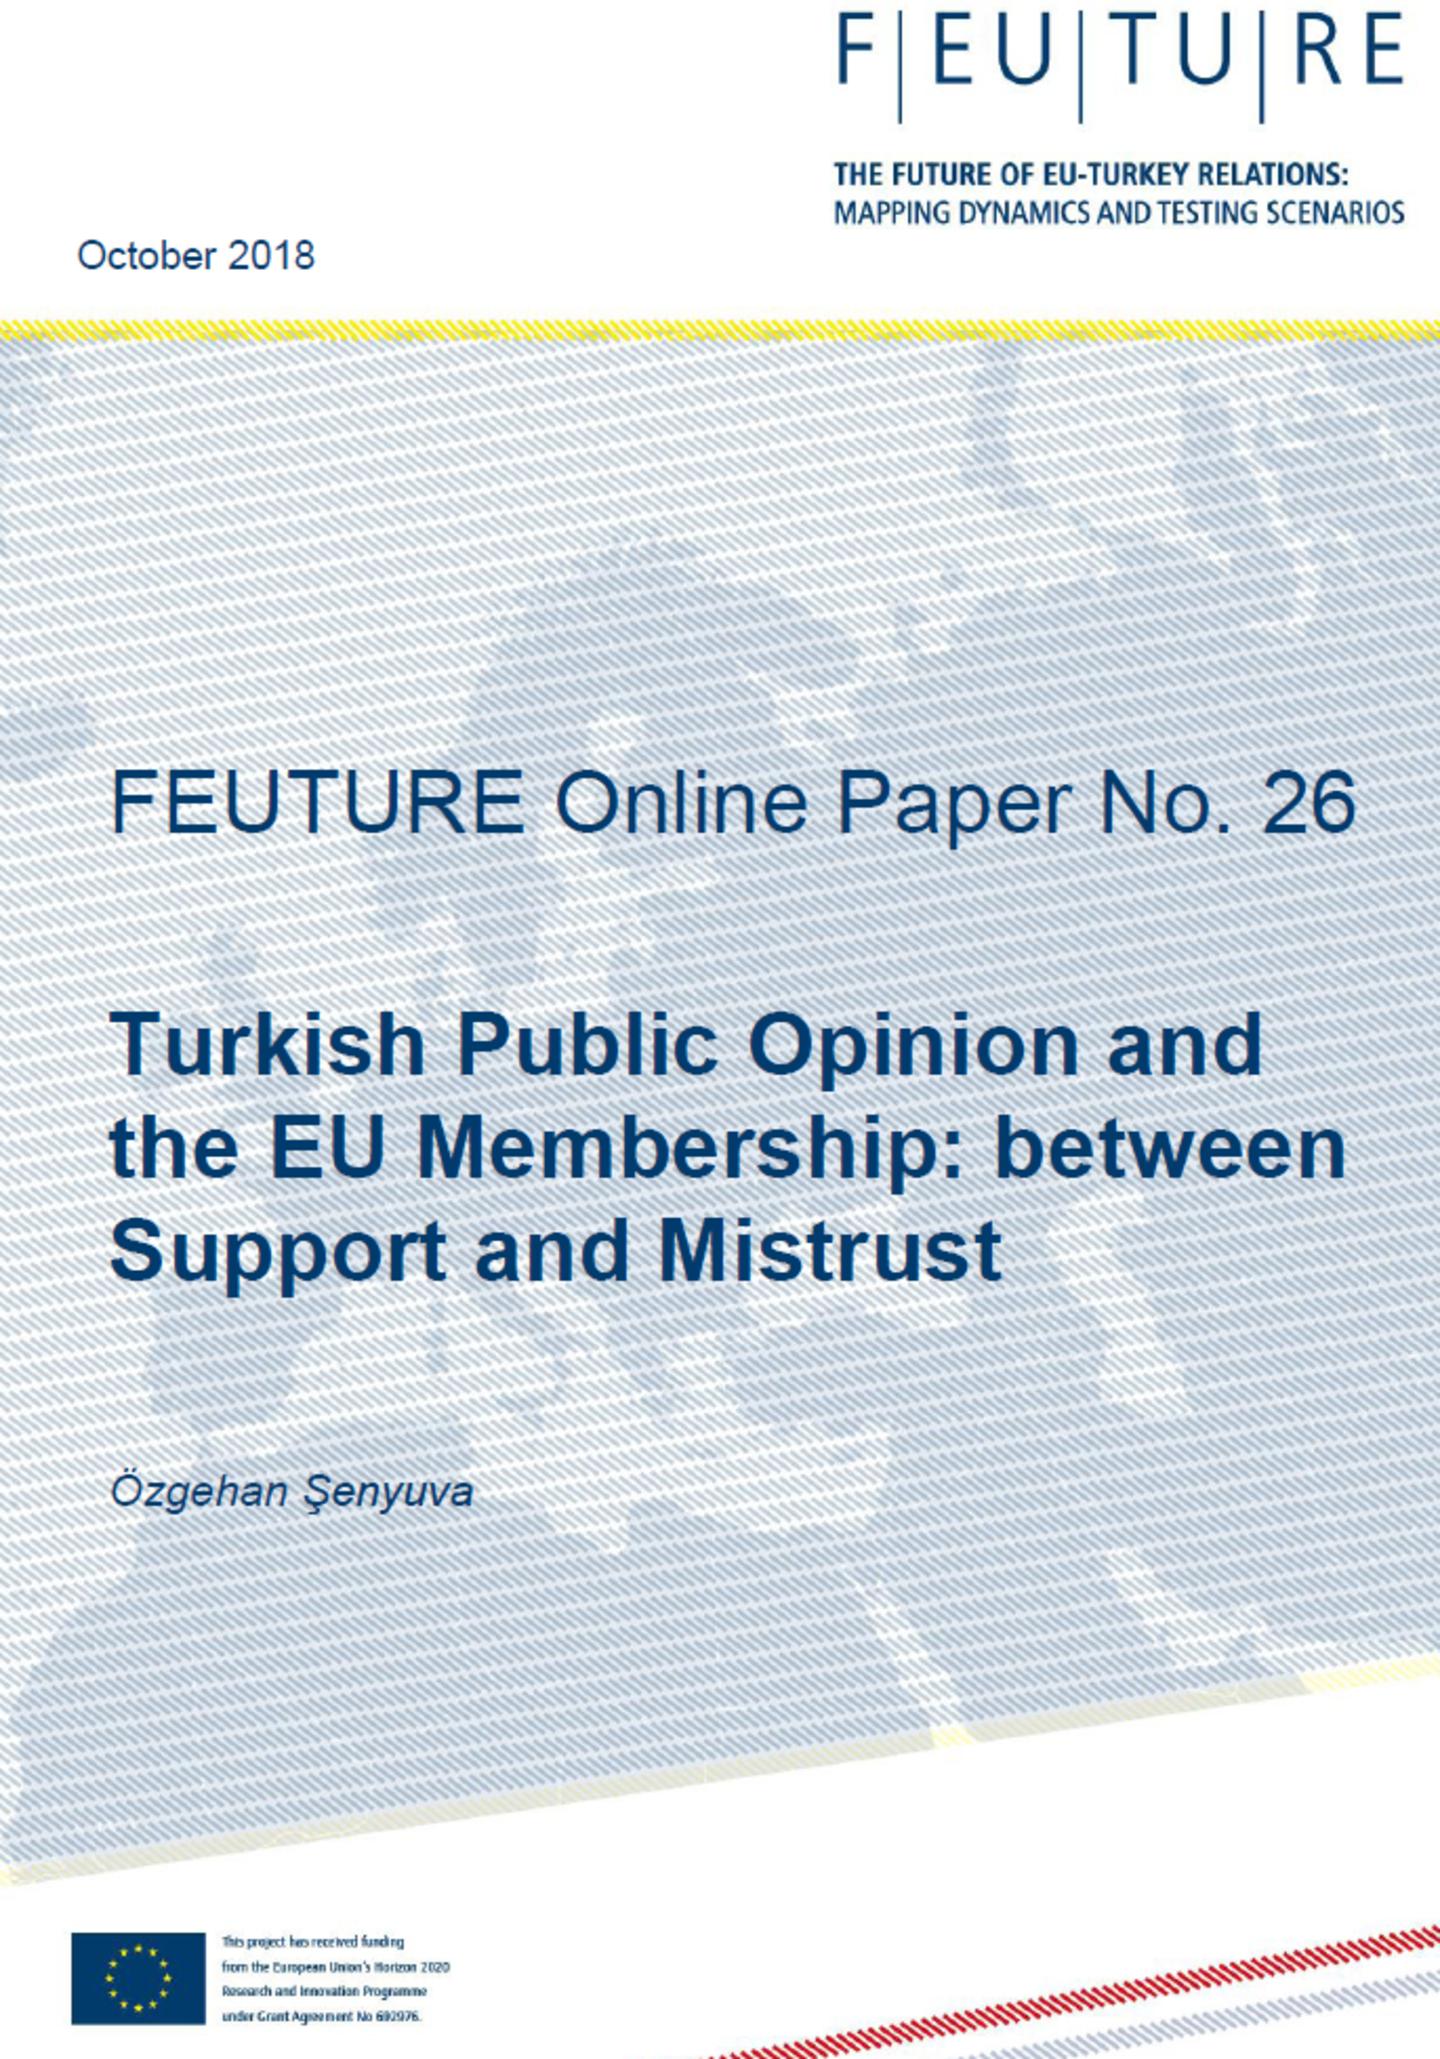 FEUTURE Online Paper Series